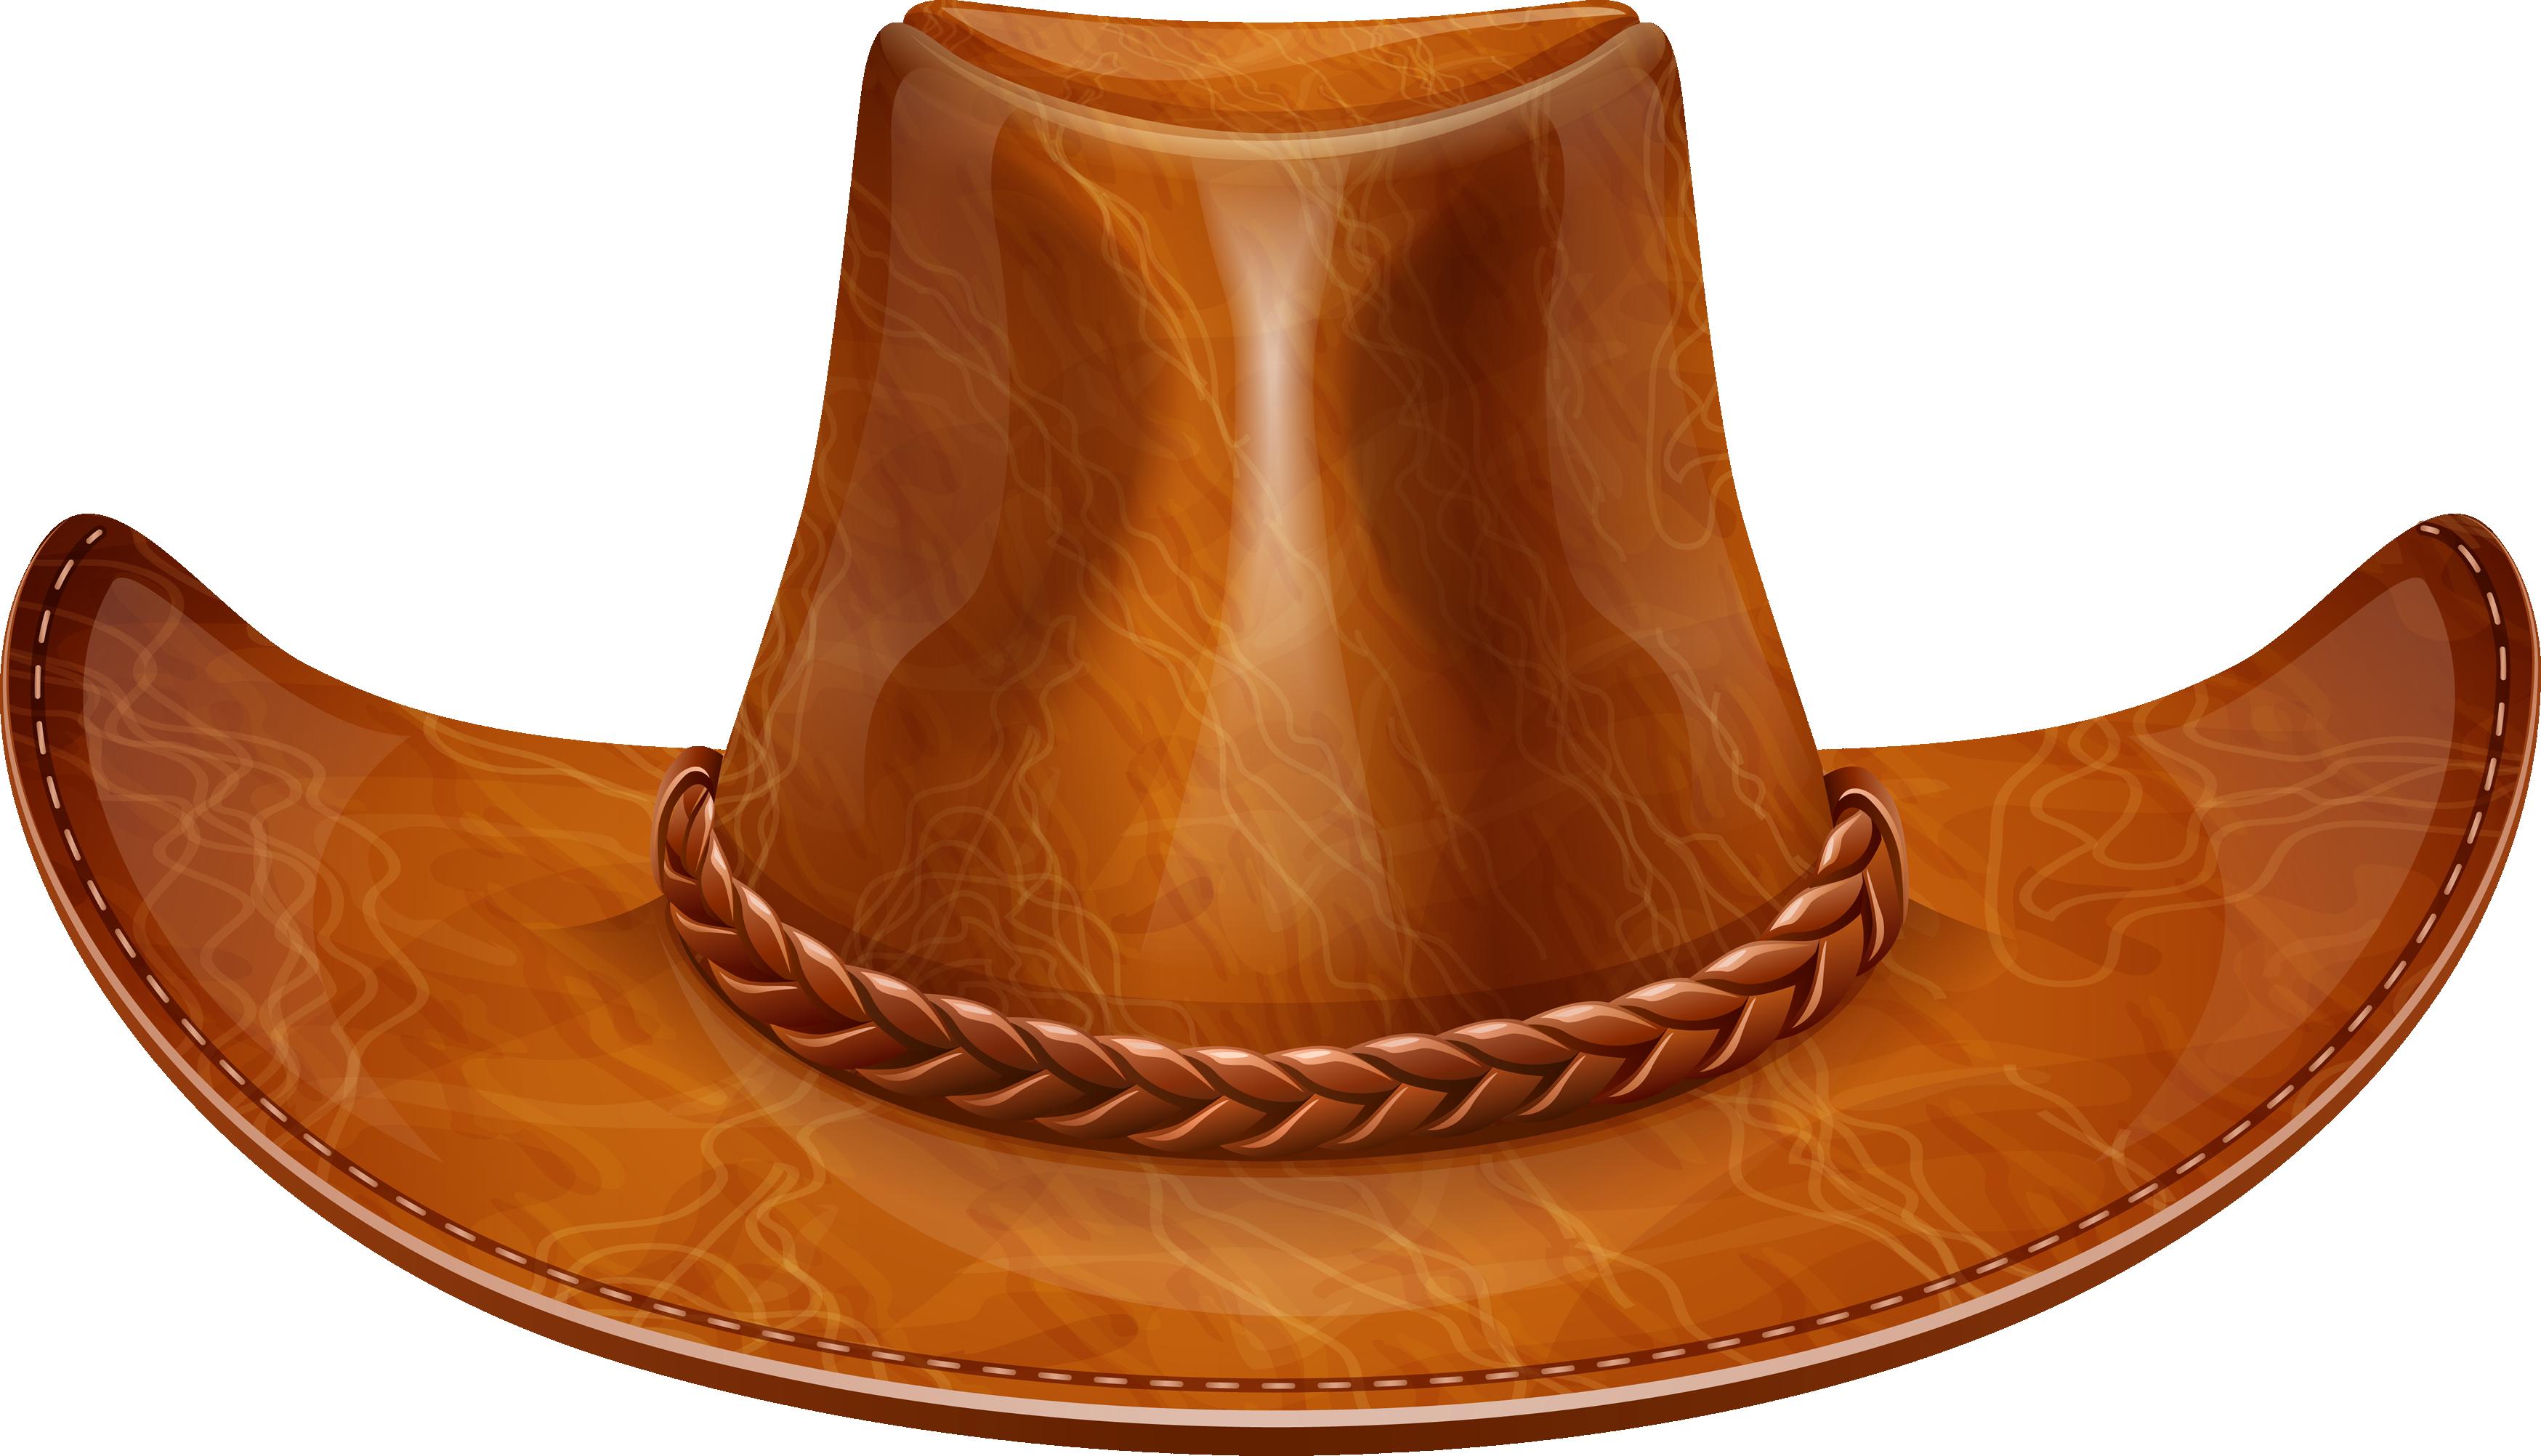 Cowboy Hat PNG Image - PurePNG   Free transparent CC0 PNG ...